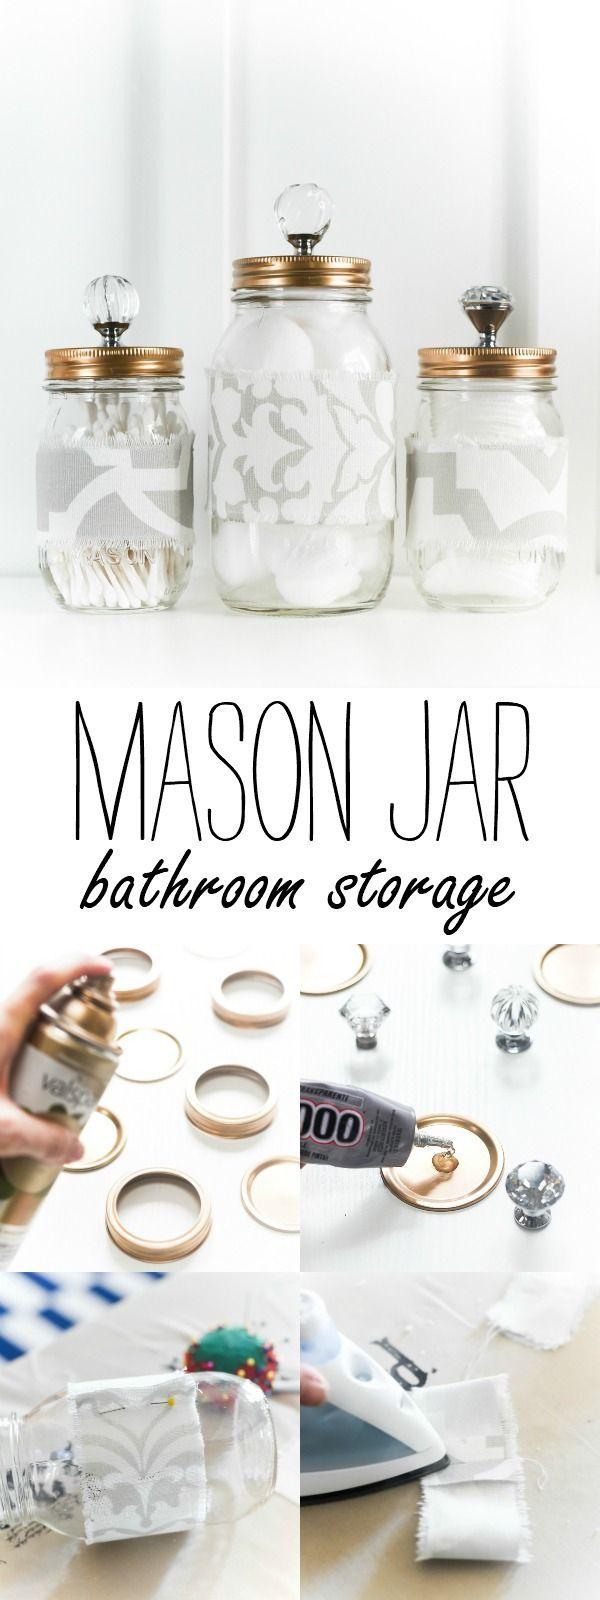 Mason Jar Cozies Bathroom Storage Bloggers Best Diy Ideas Mason